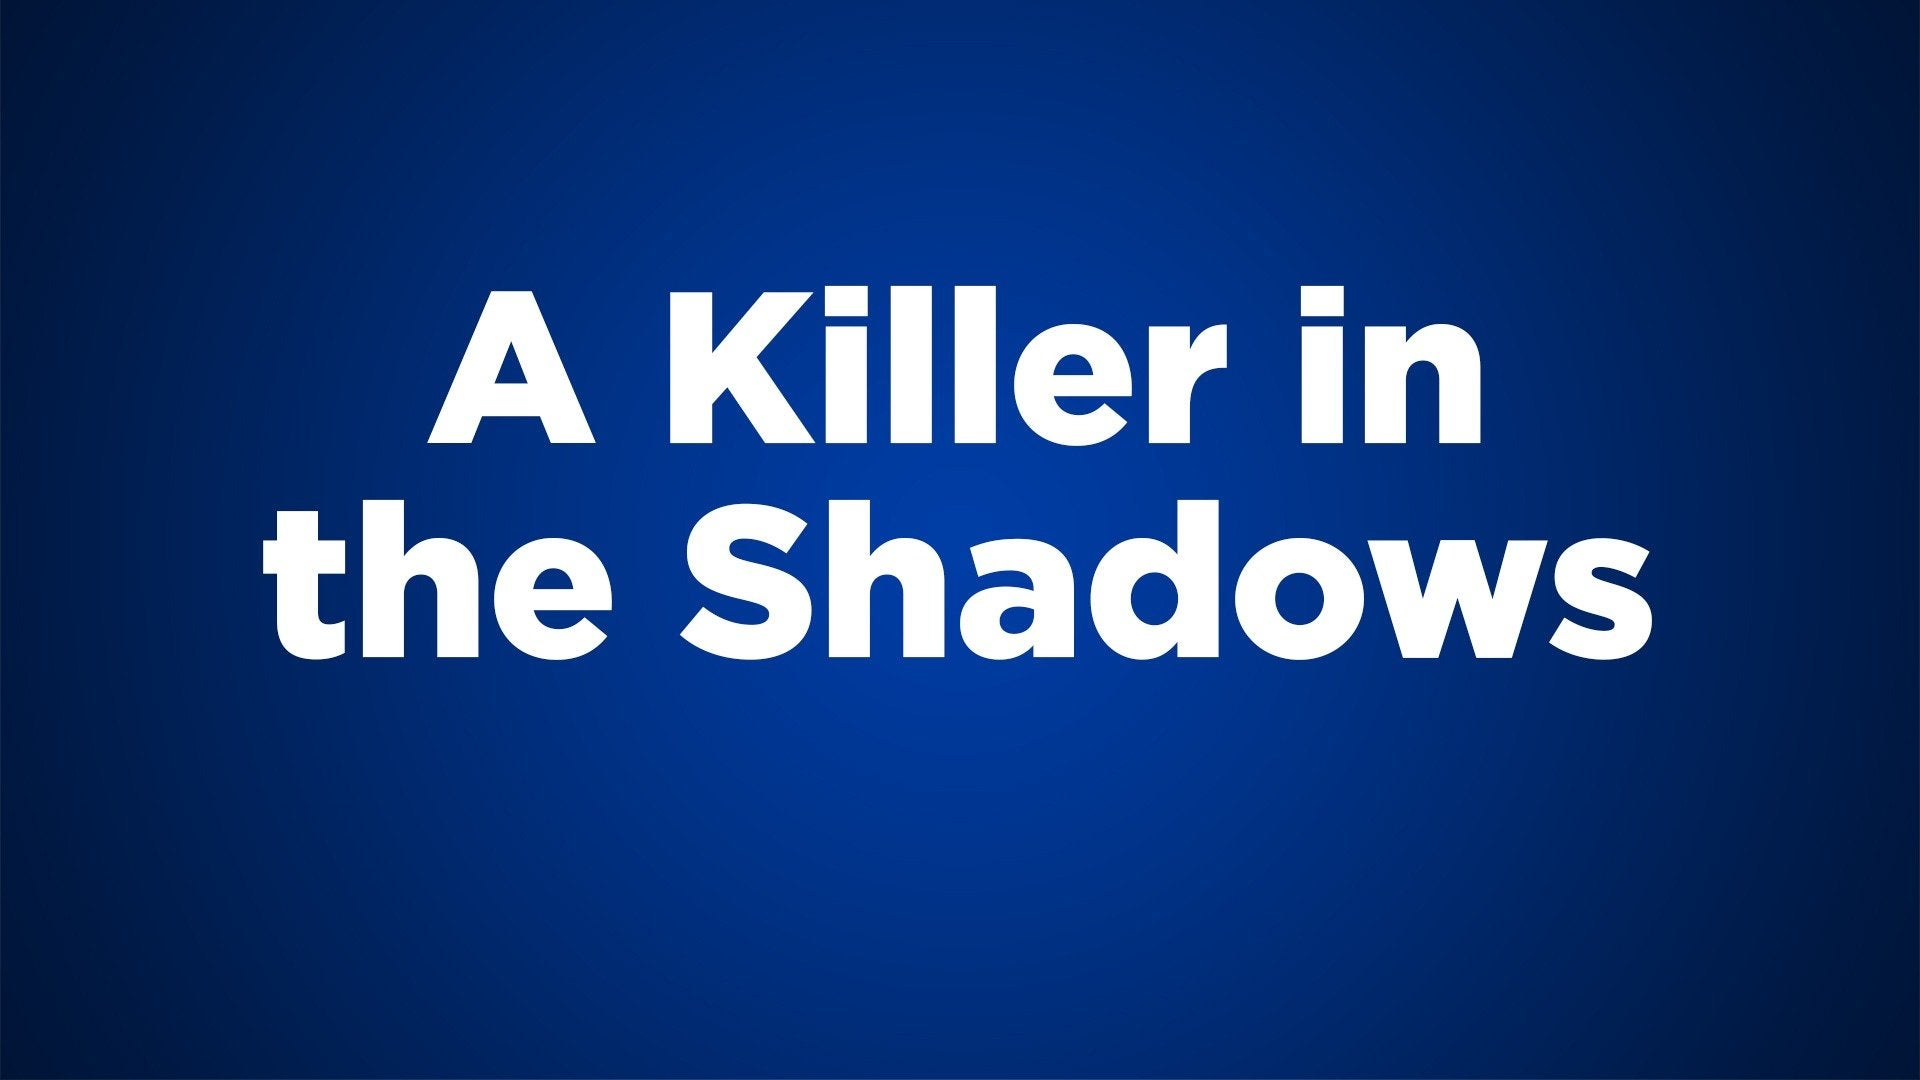 A Killer in the Shadows